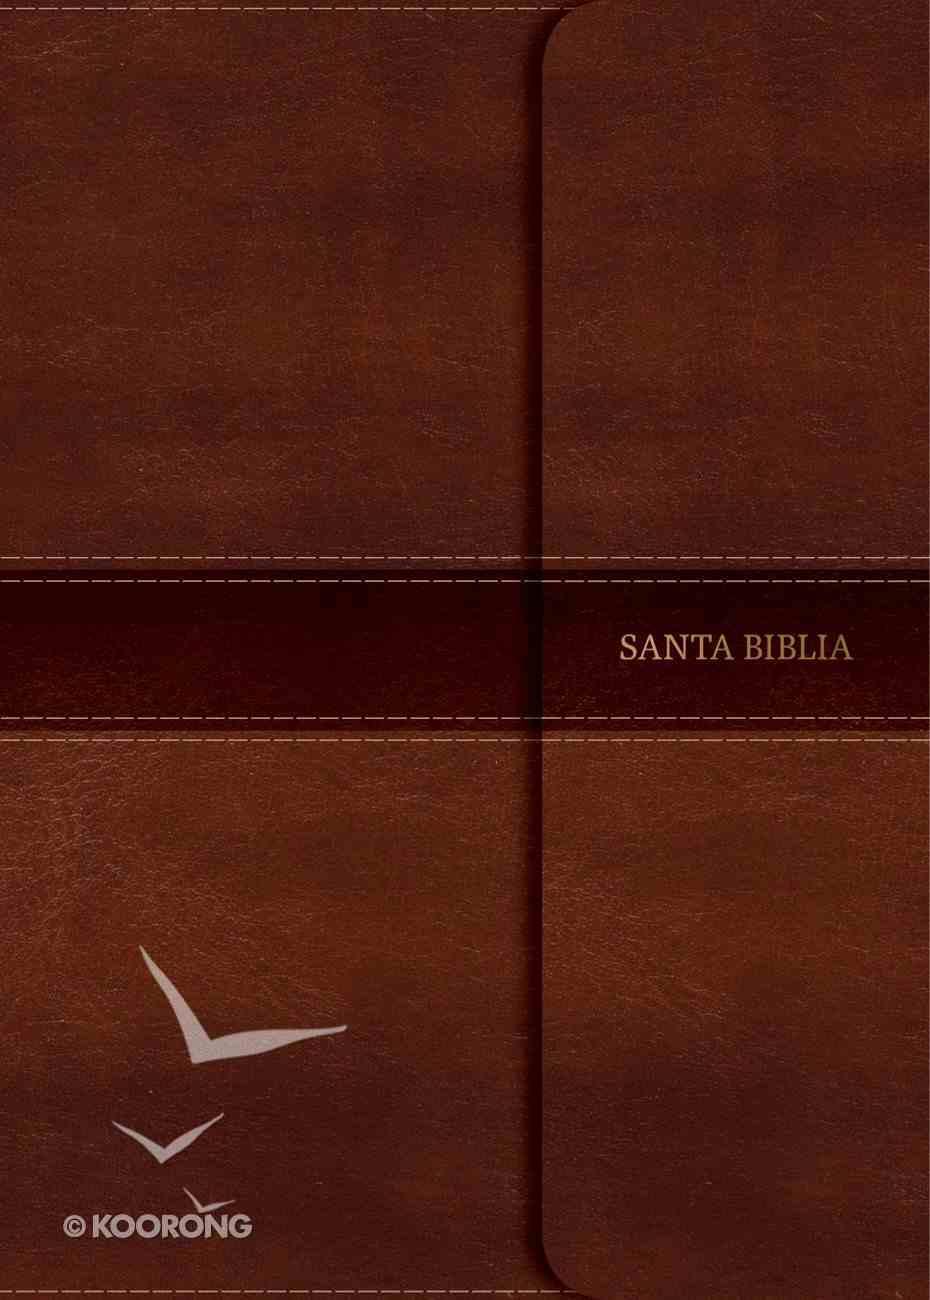 Nvi Biblia Letra Grande Tamano Manual Marron Solapa Con Iman (Giant Print Magnetic Flap) Imitation Leather